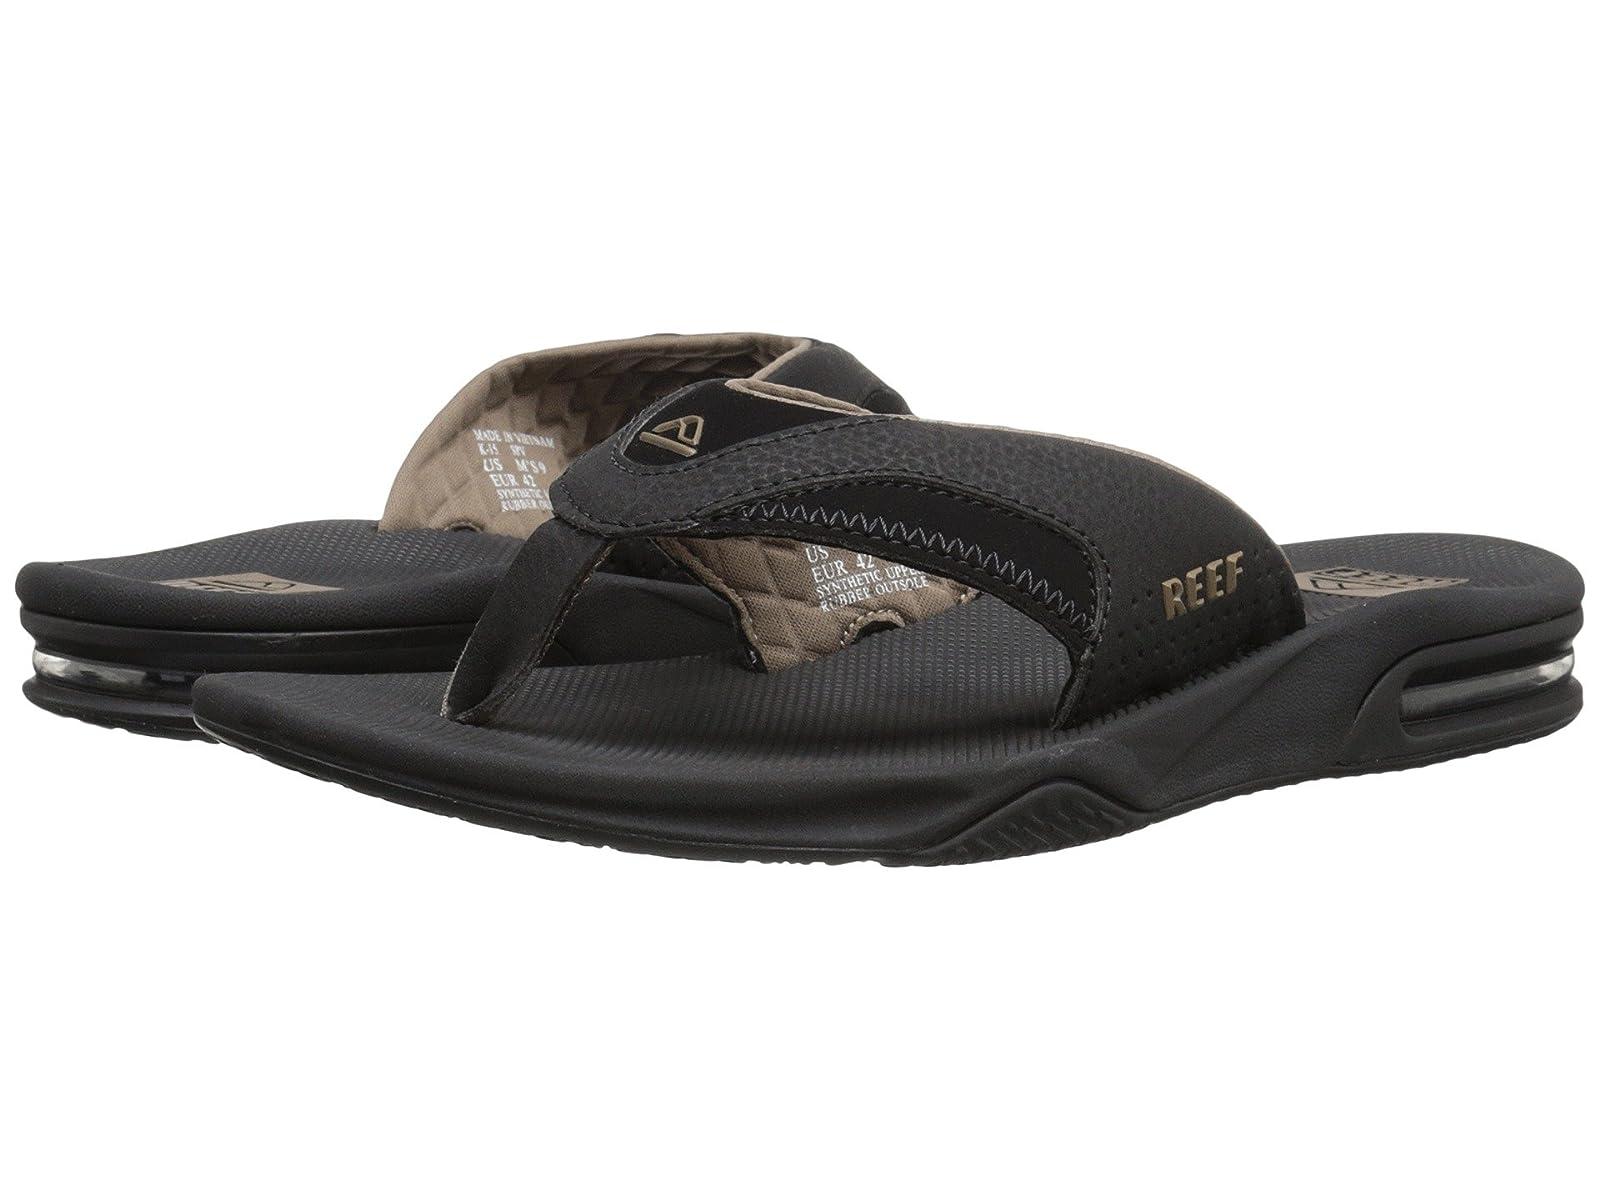 Reef FanningAtmospheric grades have affordable shoes